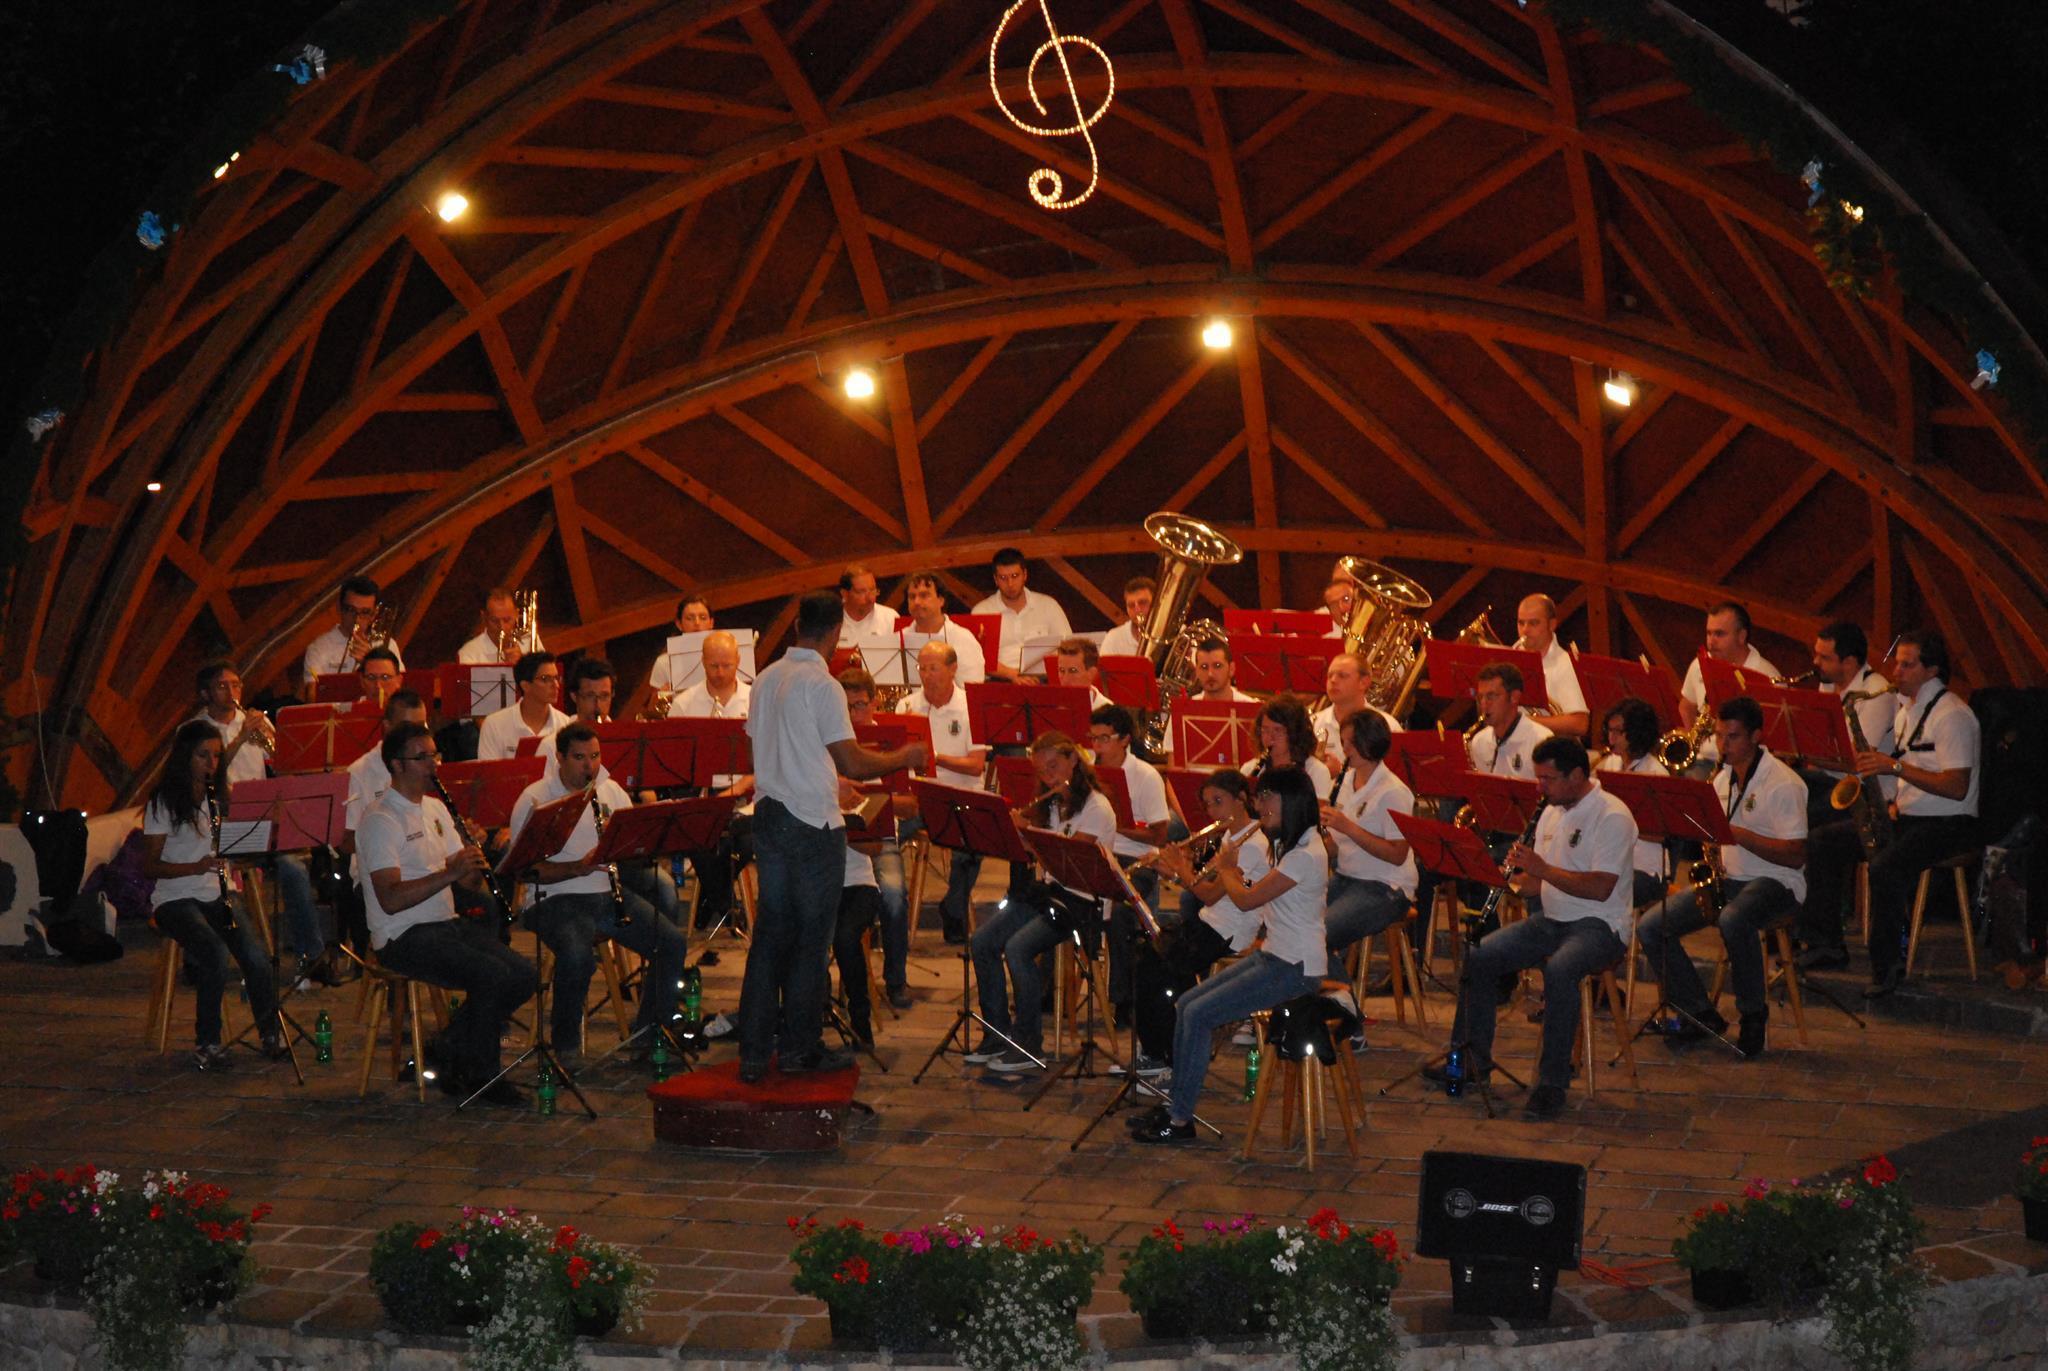 Banda  Musicale Comunale di Farra d'Alpago 1 von 3